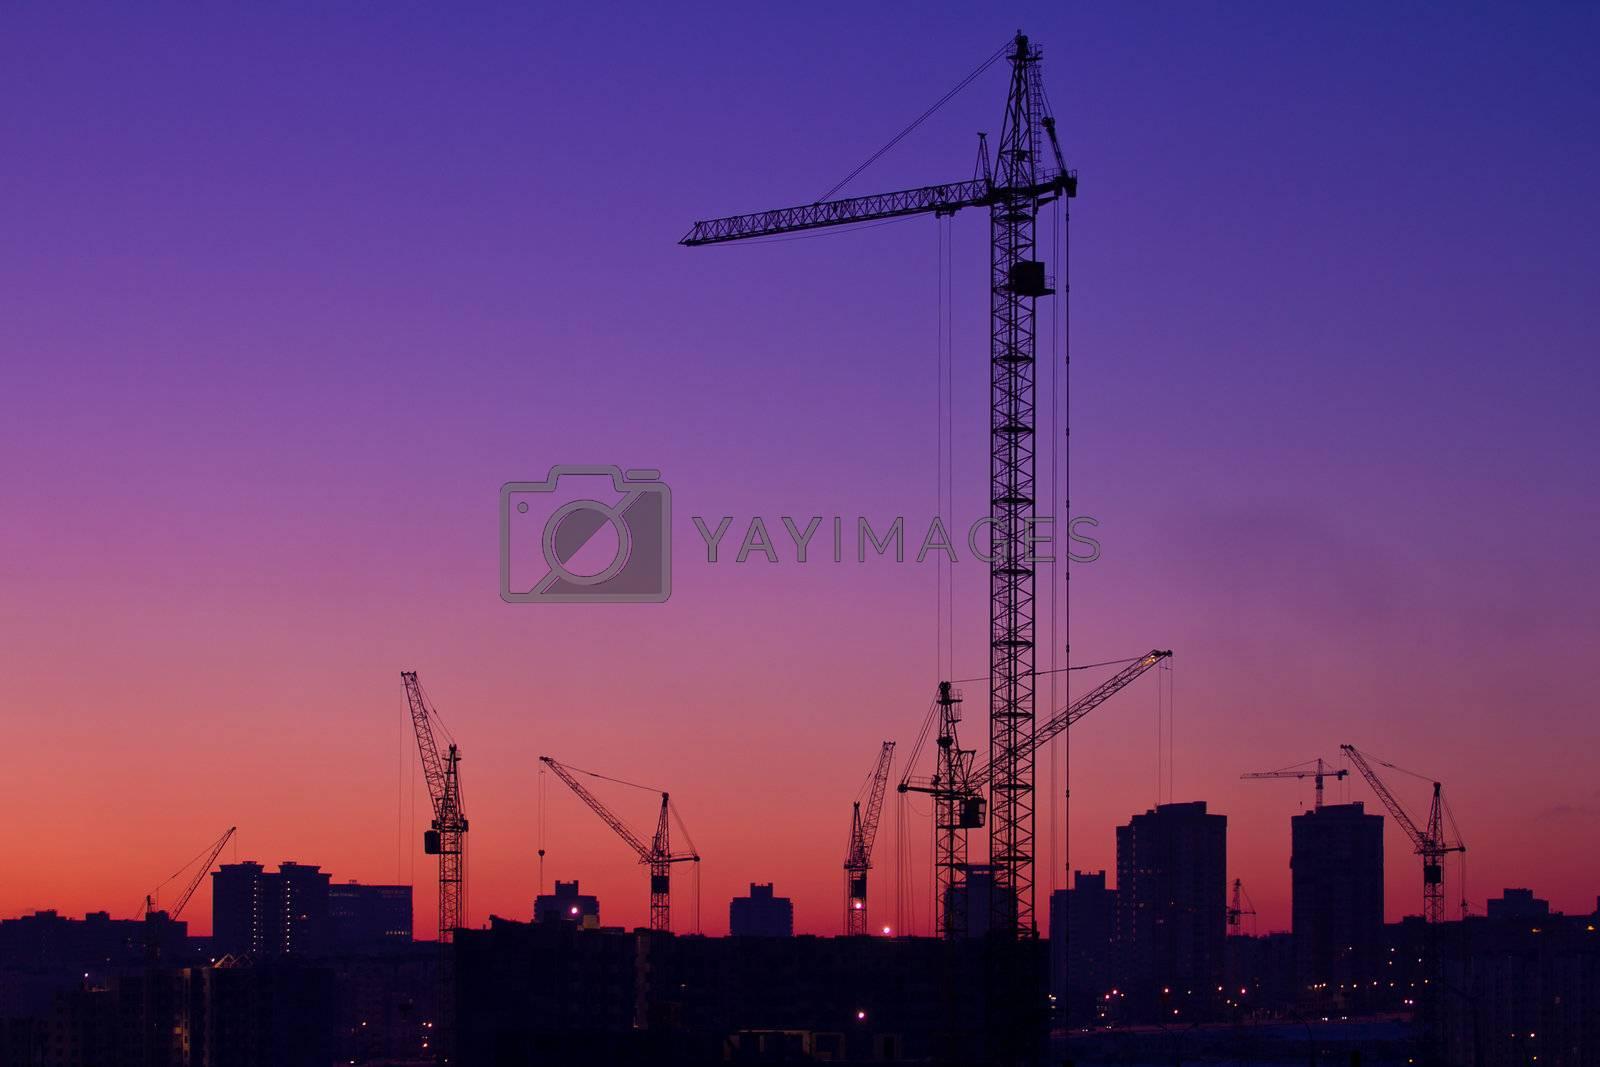 city under construction on sunrise